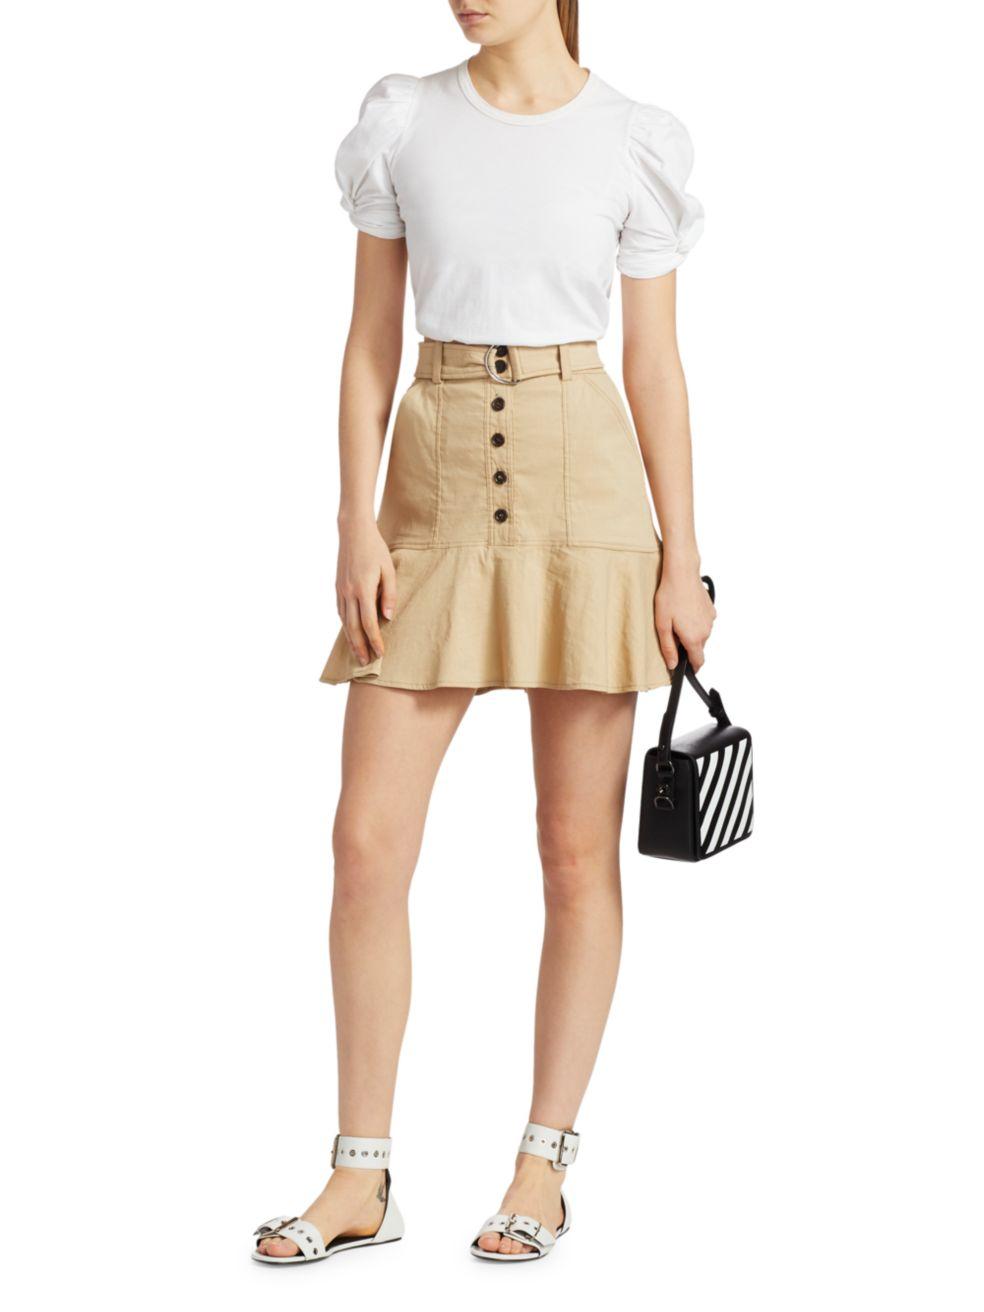 A.L.C. Miley Button-Front Flirty Skirt   SaksFifthAvenue